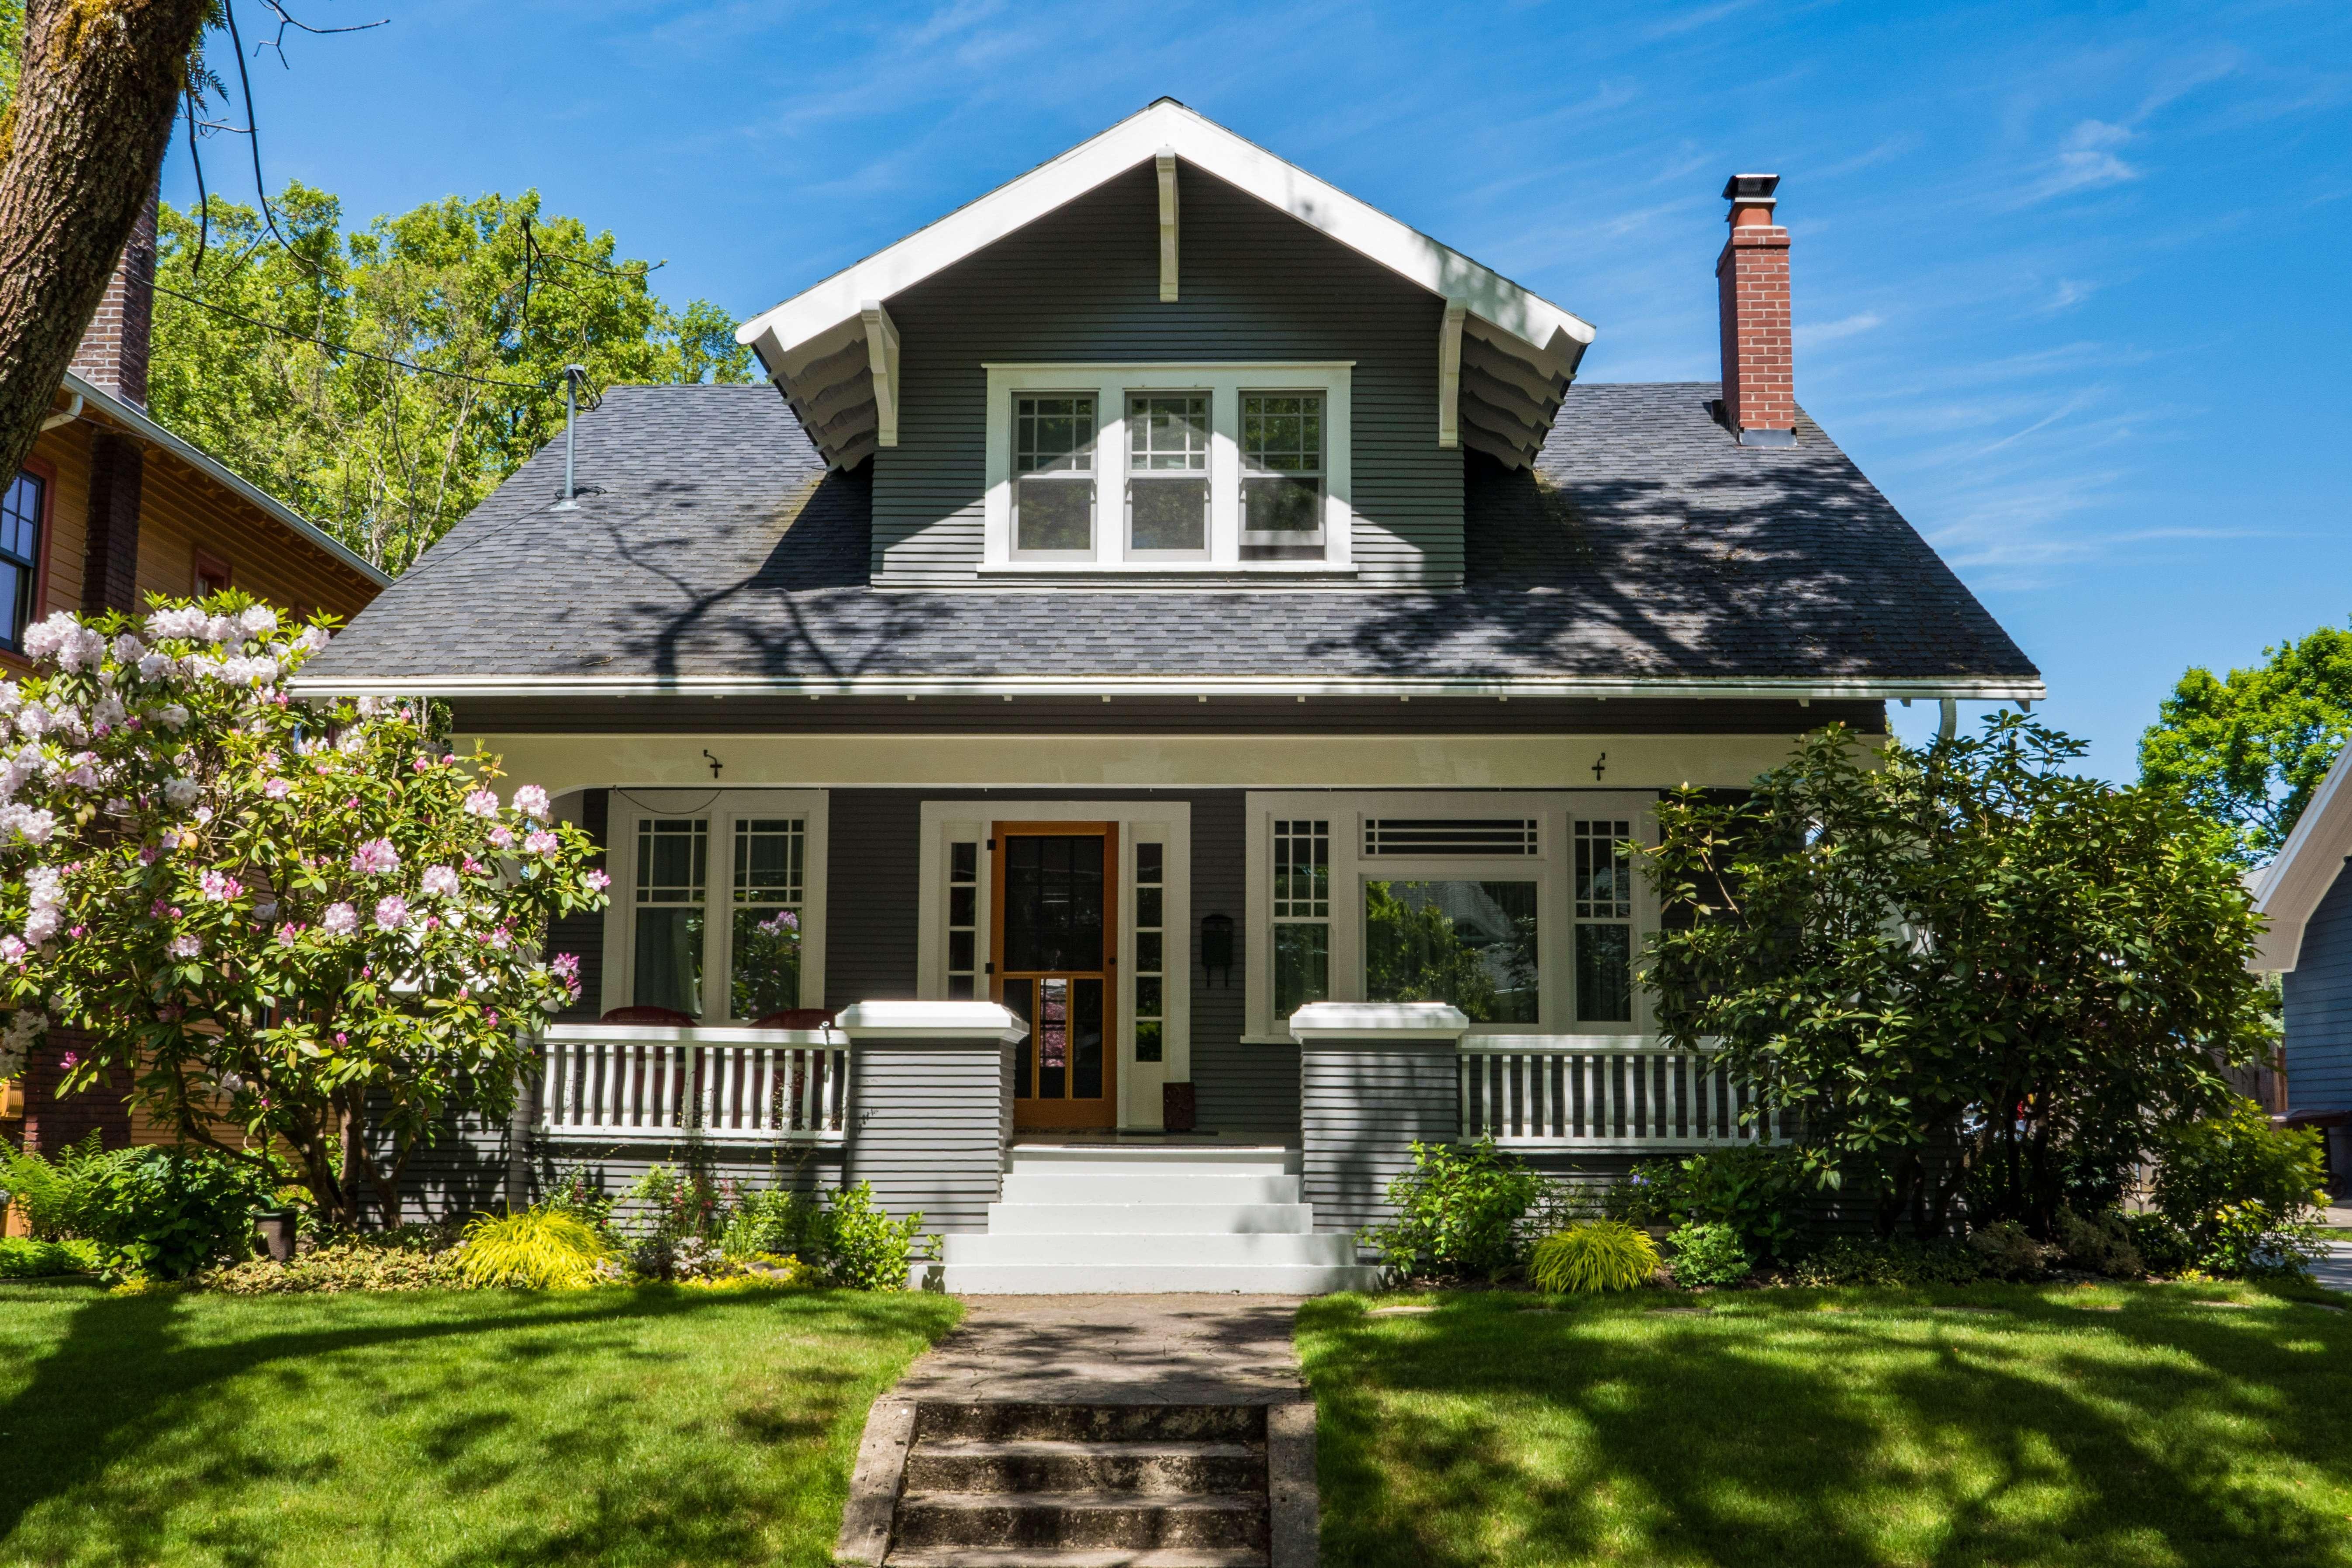 America Favorite Kind House Poll Says Money